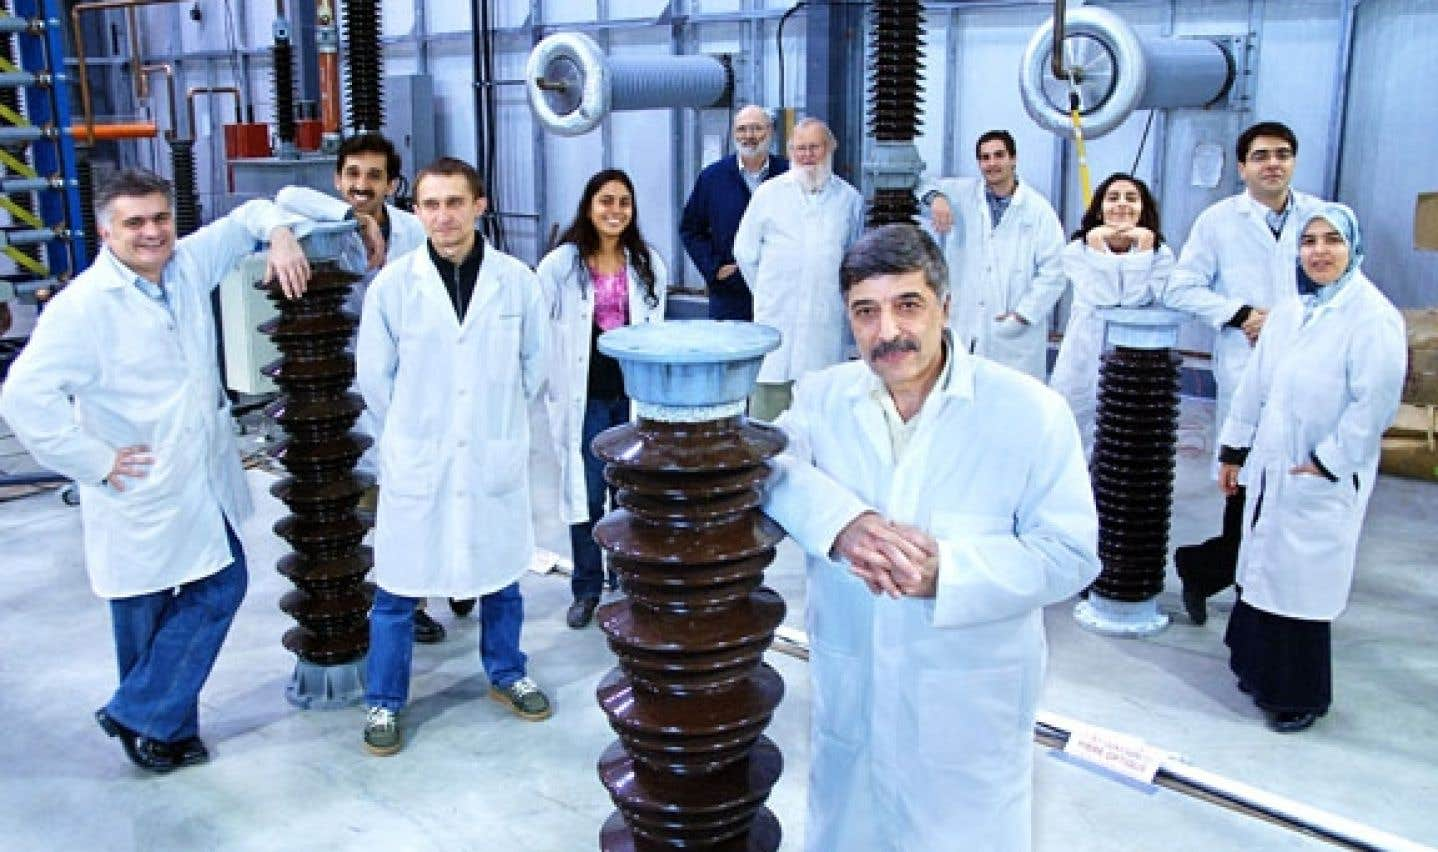 Masoud Farzaneh et son équipe de recherche